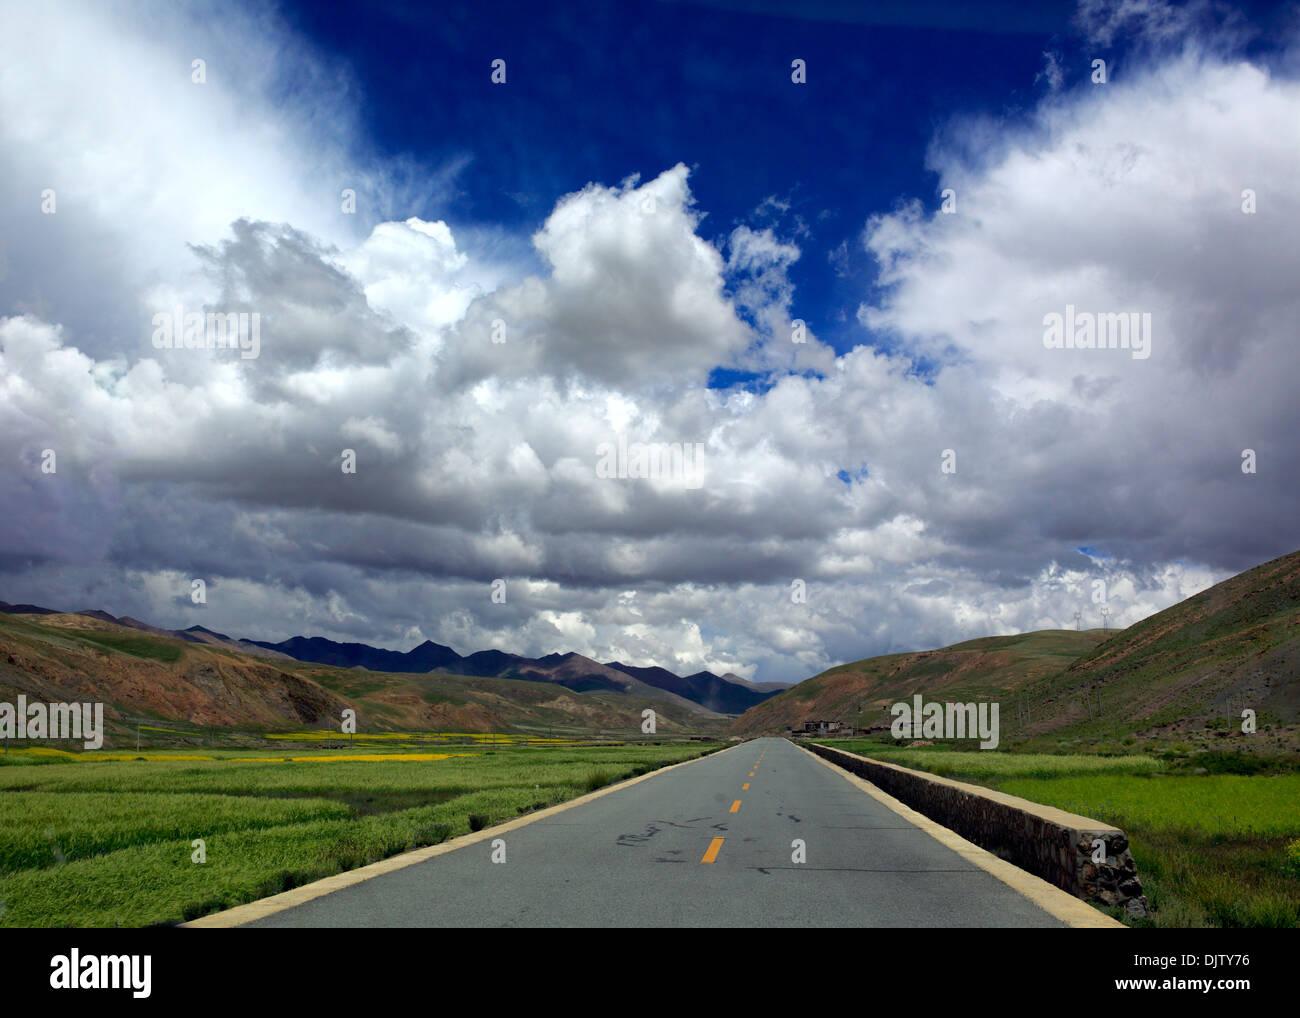 Road from Gyangtse to Tsangpo valley, Shigatse Prefecture, Tibet, China - Stock Image